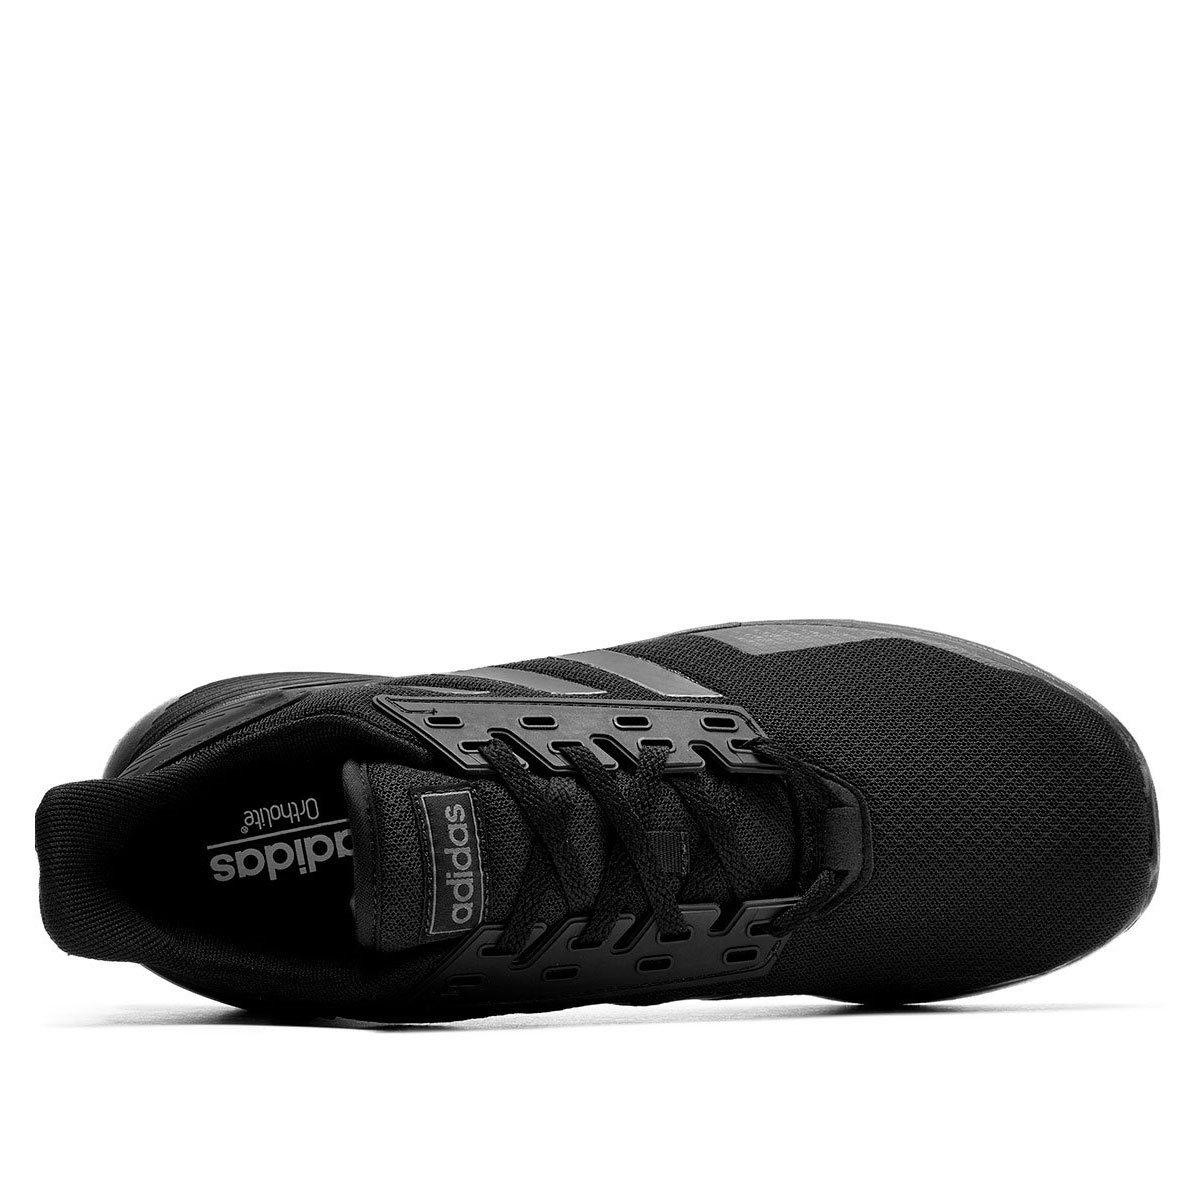 5aa8697832e Оригинални Мъжки Маратонки Adidas Duramo 9 black - ShopSector.com